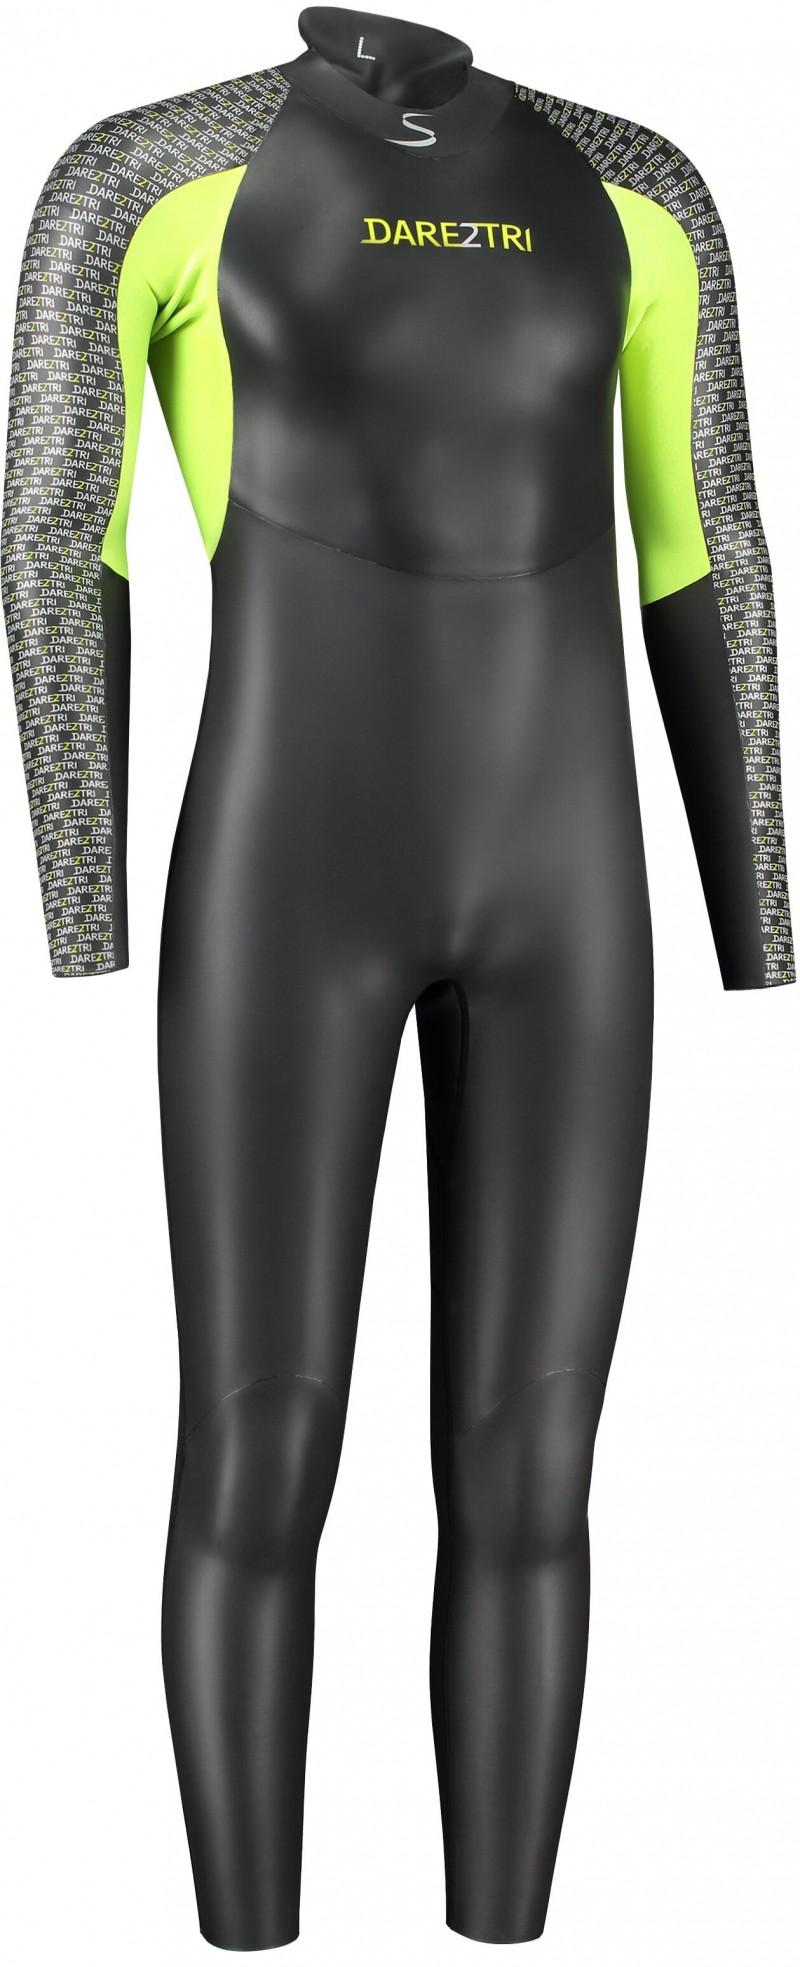 Dare2Tri - To Swim Wetsuit (Size Medium Tall)